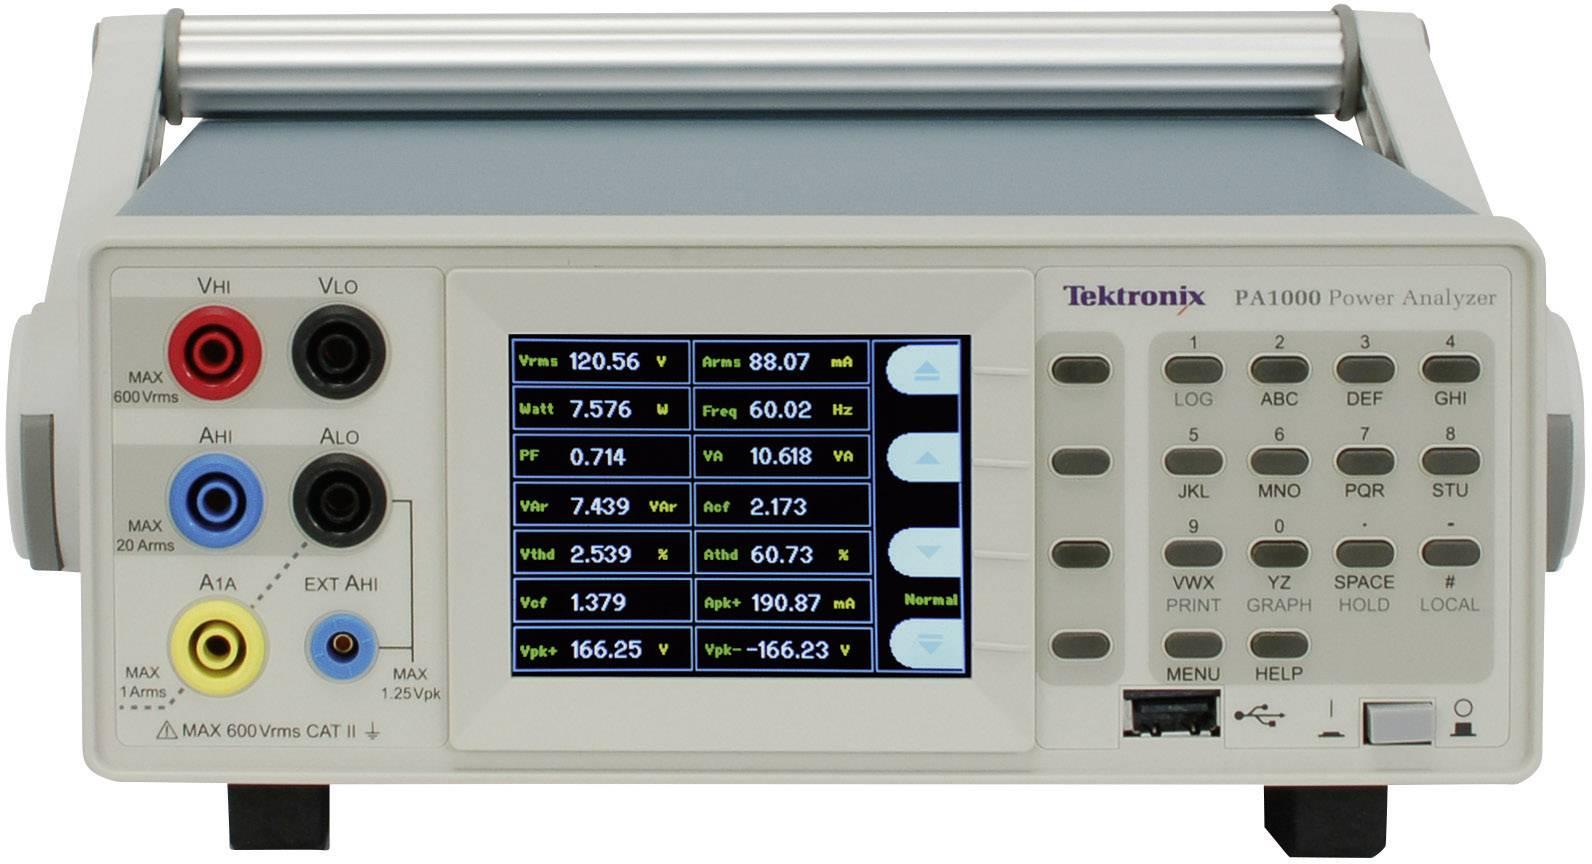 Analyzátor výkonu Tektronix PA1000